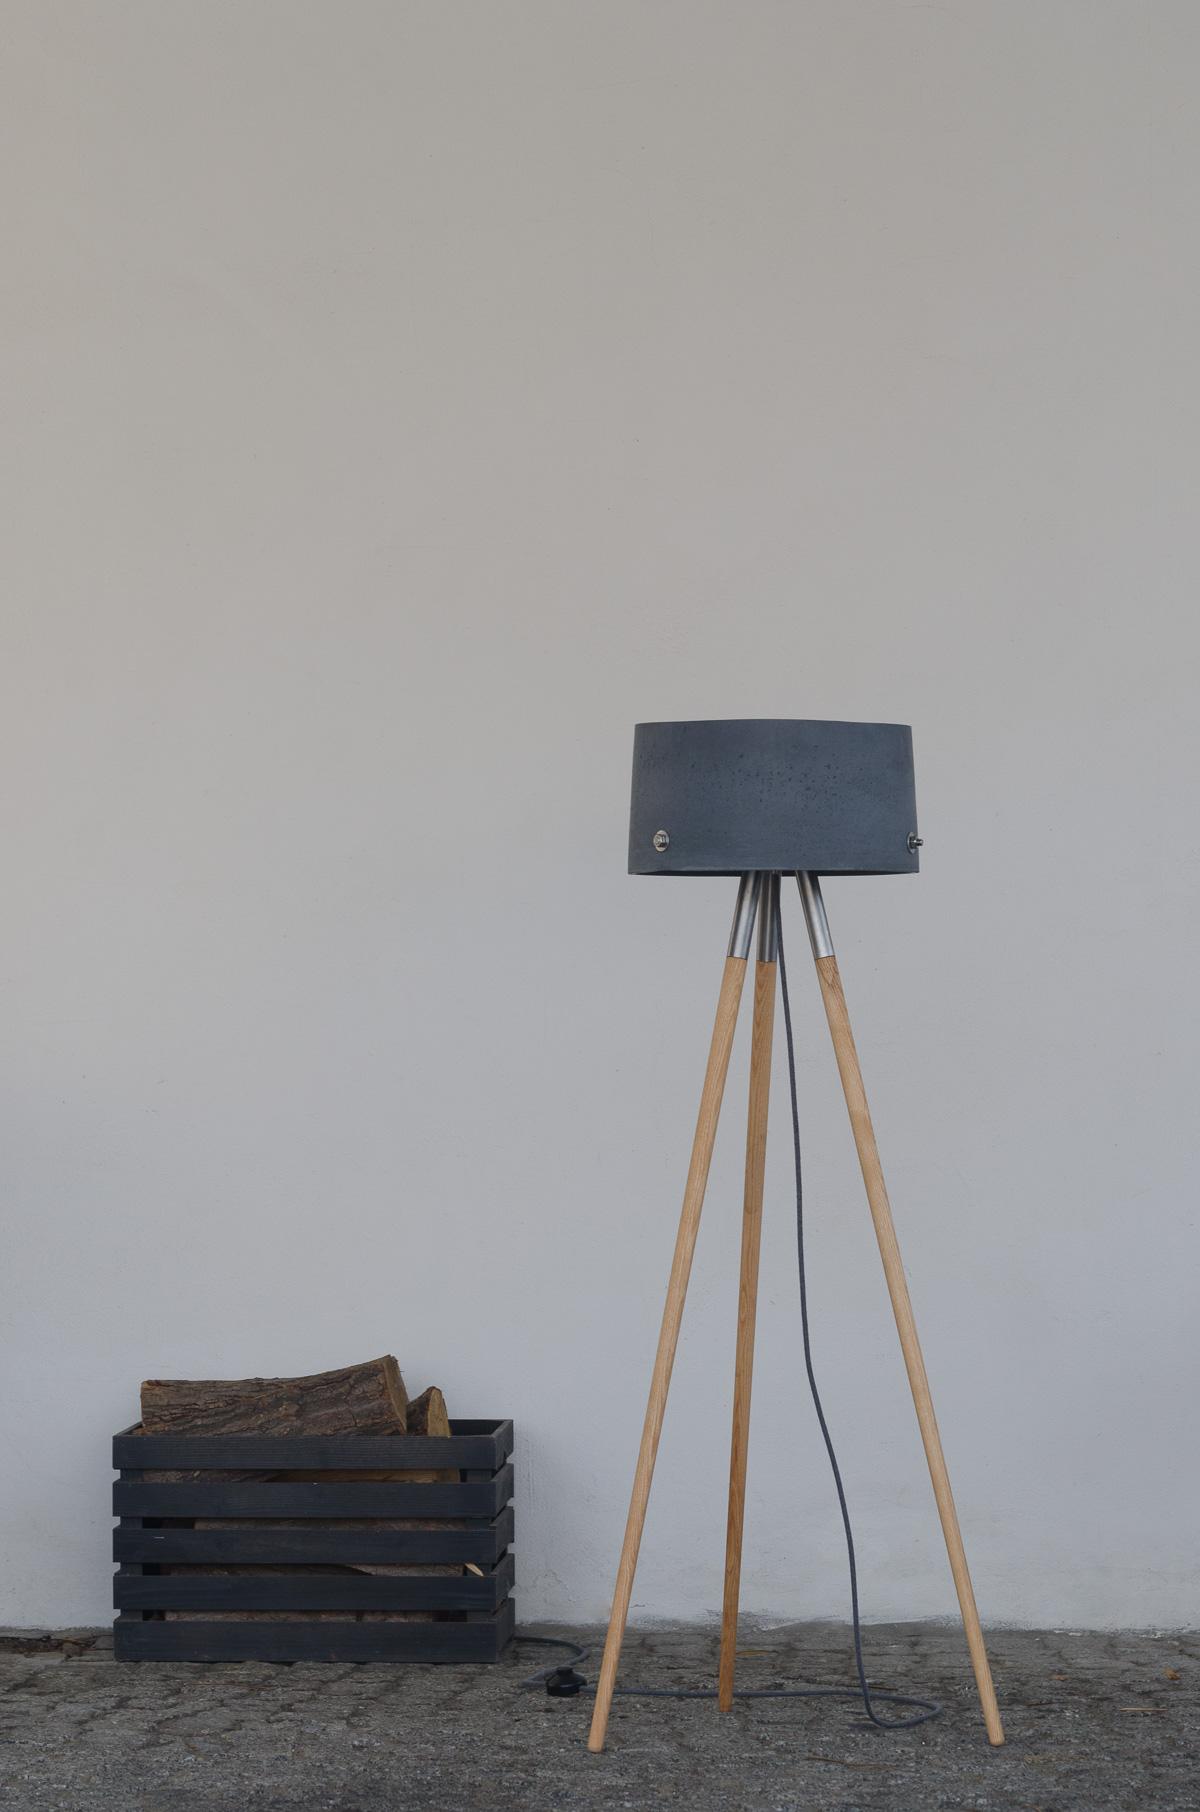 Berühmt Beton-Stehlampe Talma - DSLampen.at - Lampen und Leuchten Online @PG_28